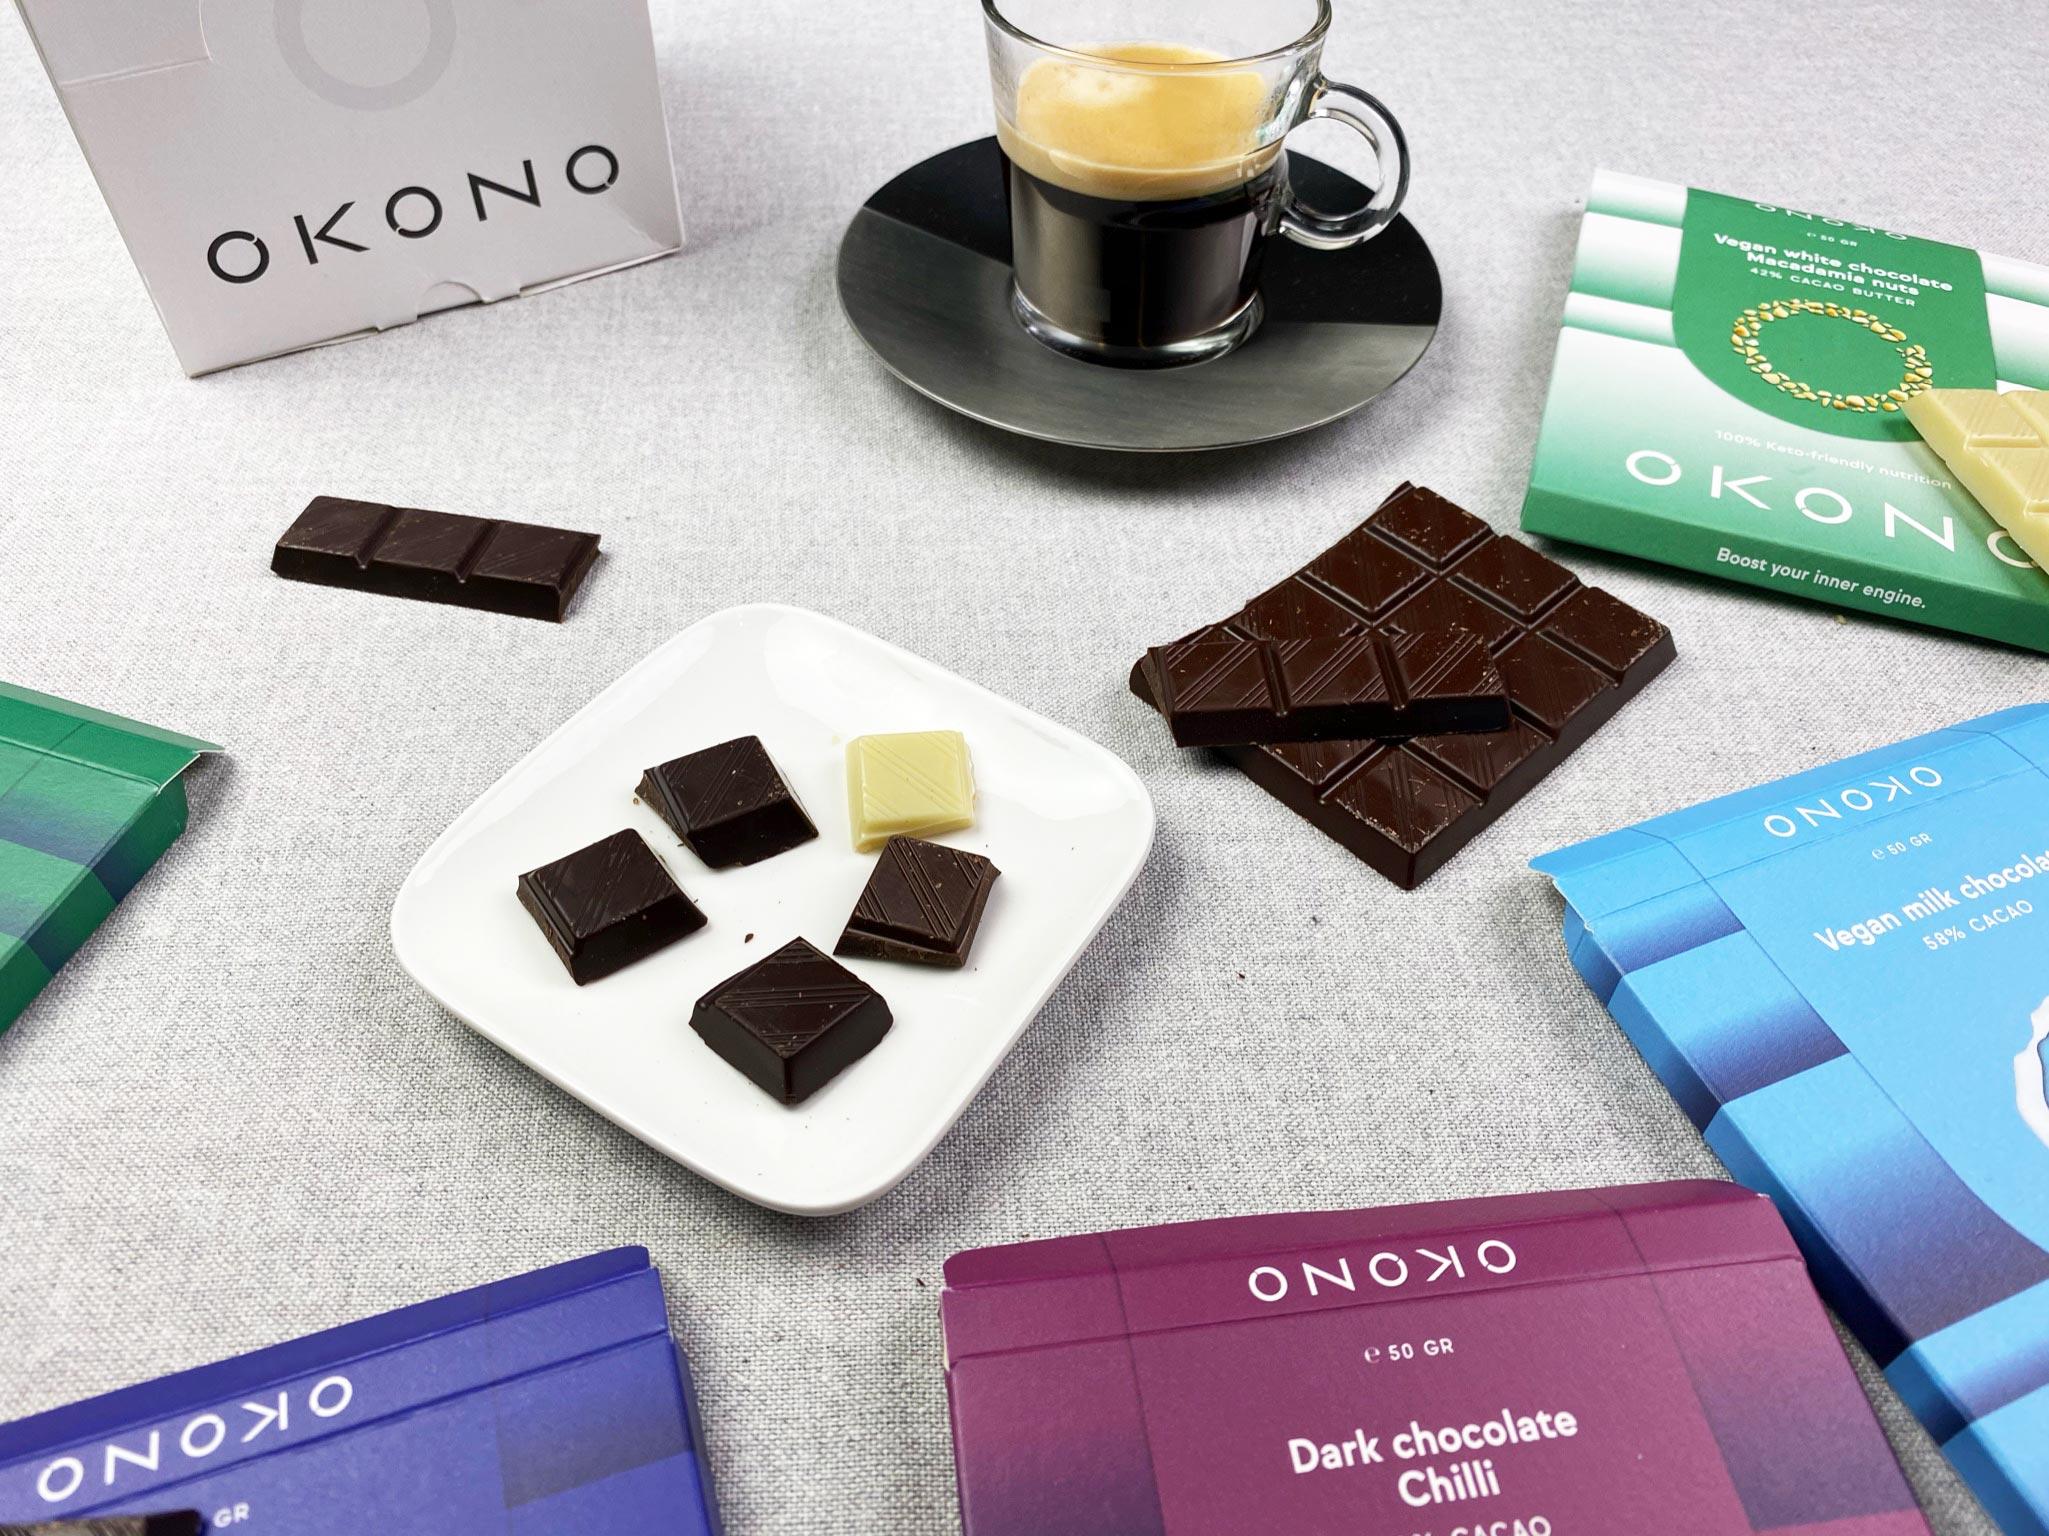 OKONO Belgische Keto Chocolade review